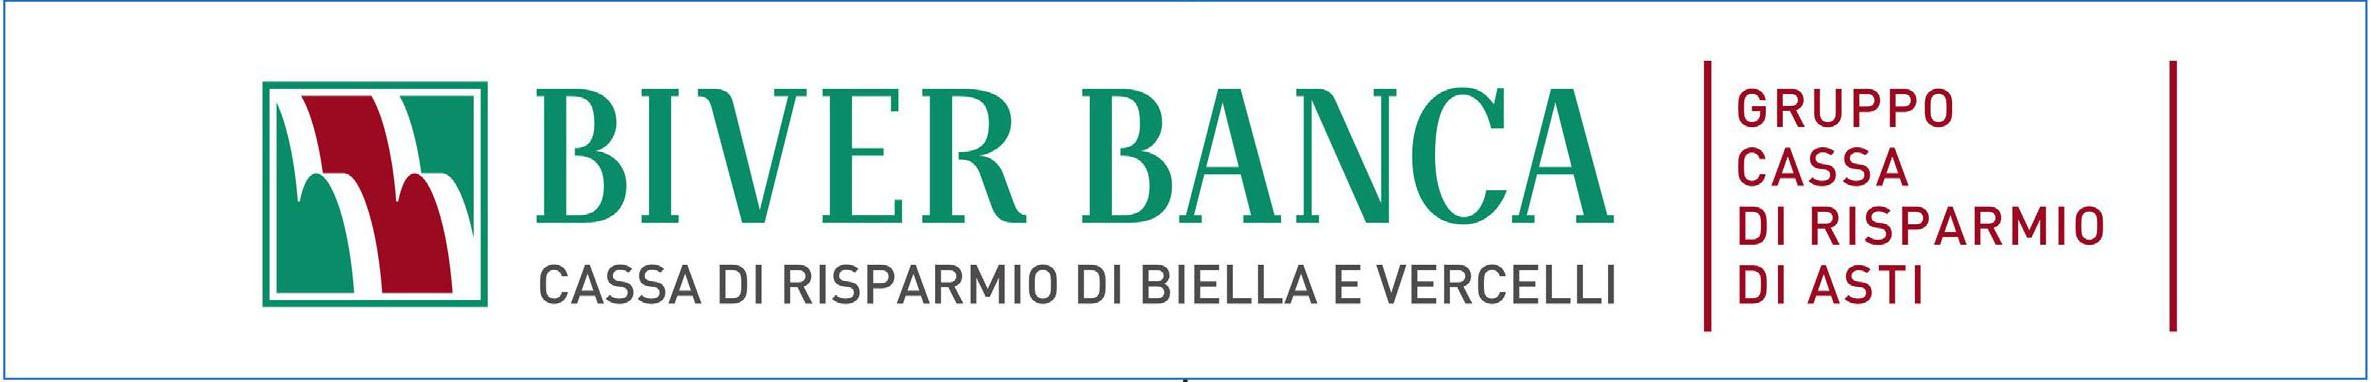 logo_biver